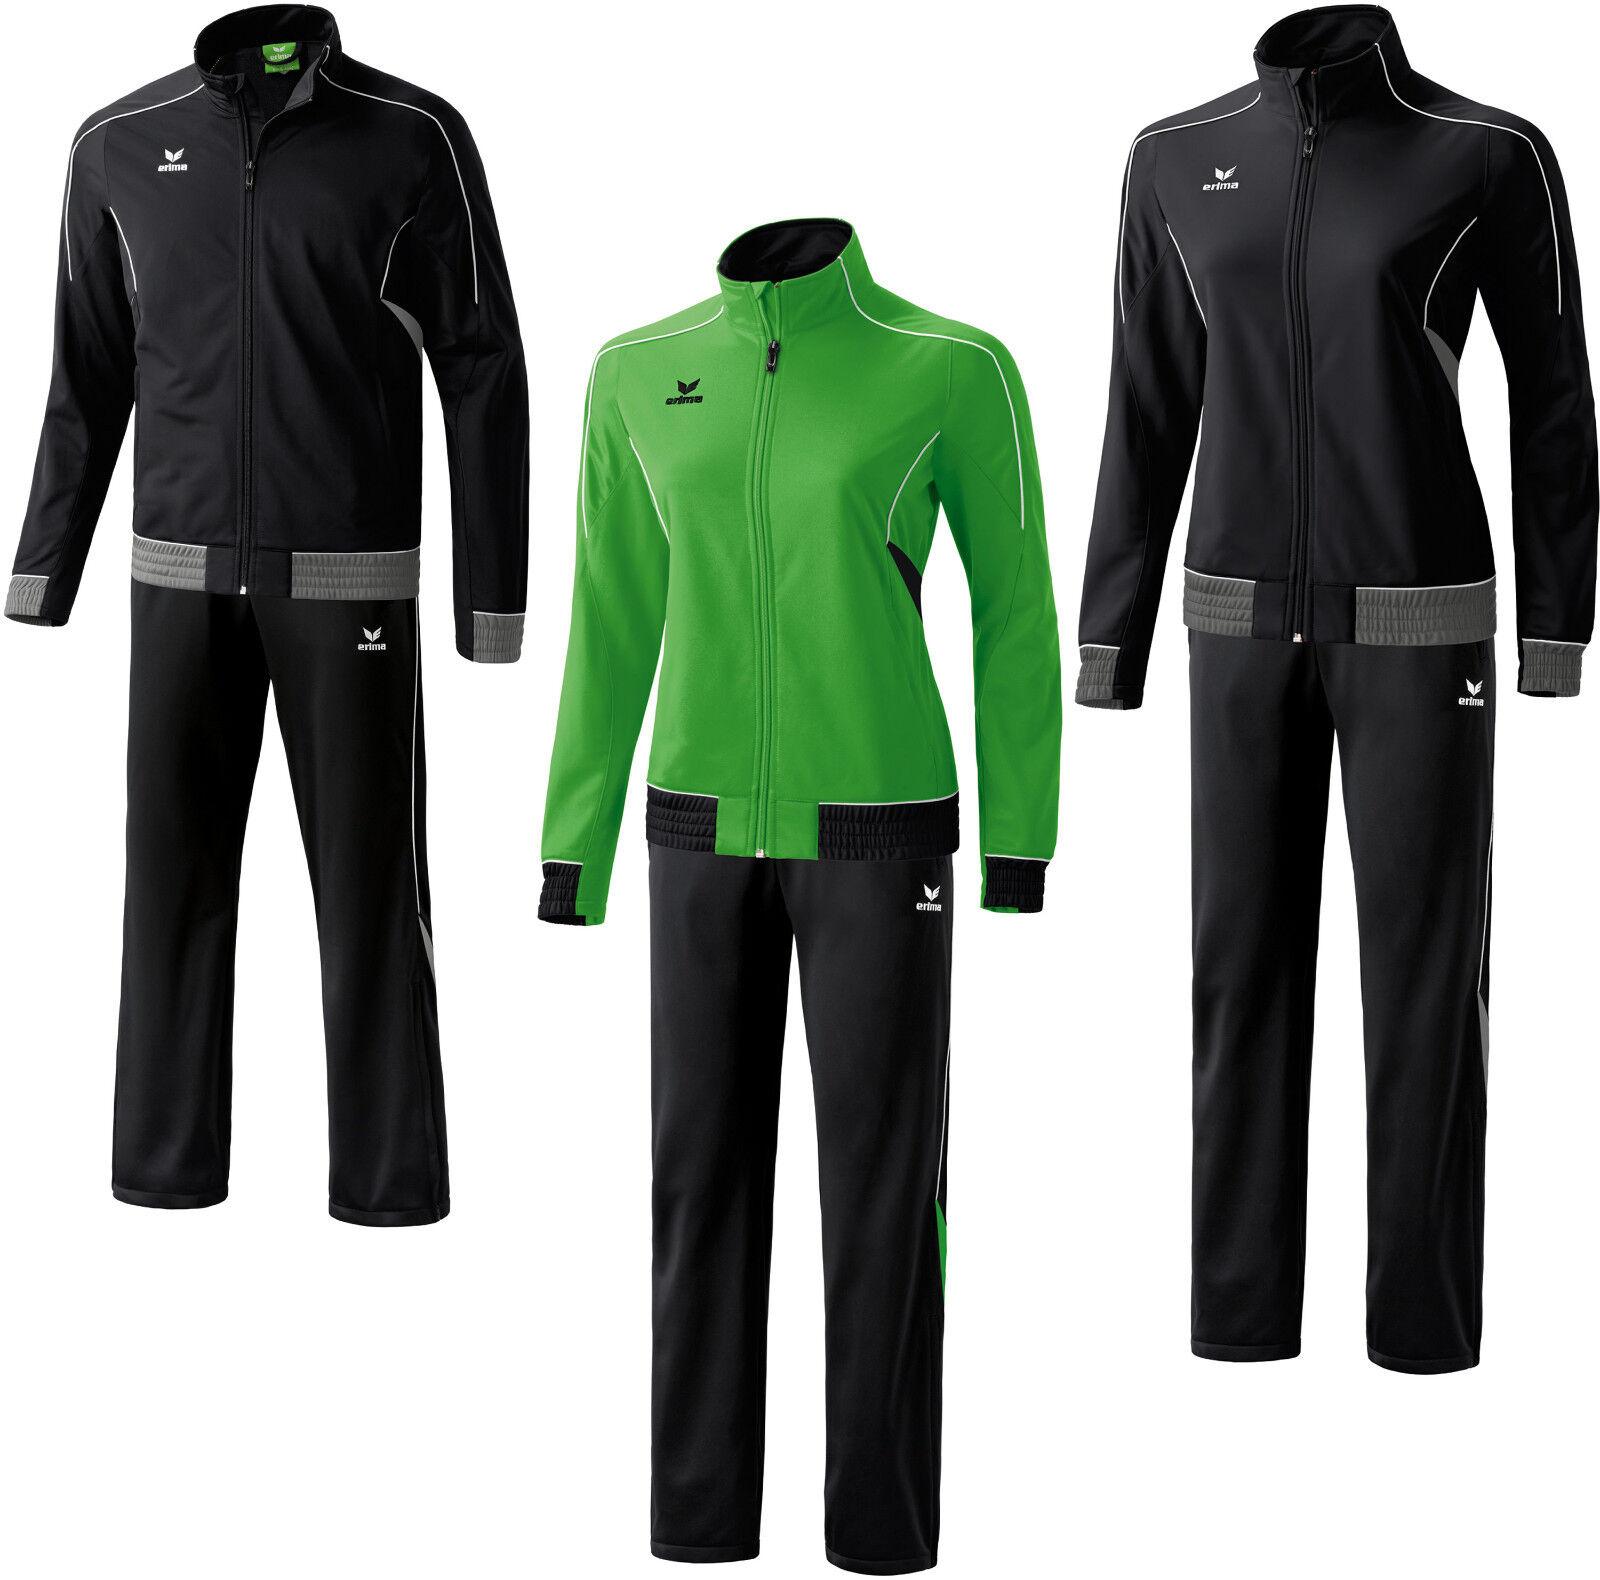 Erima Gold Medal Line Polyesteranzug Trainingsanzug Sportanzug Jogginganzug